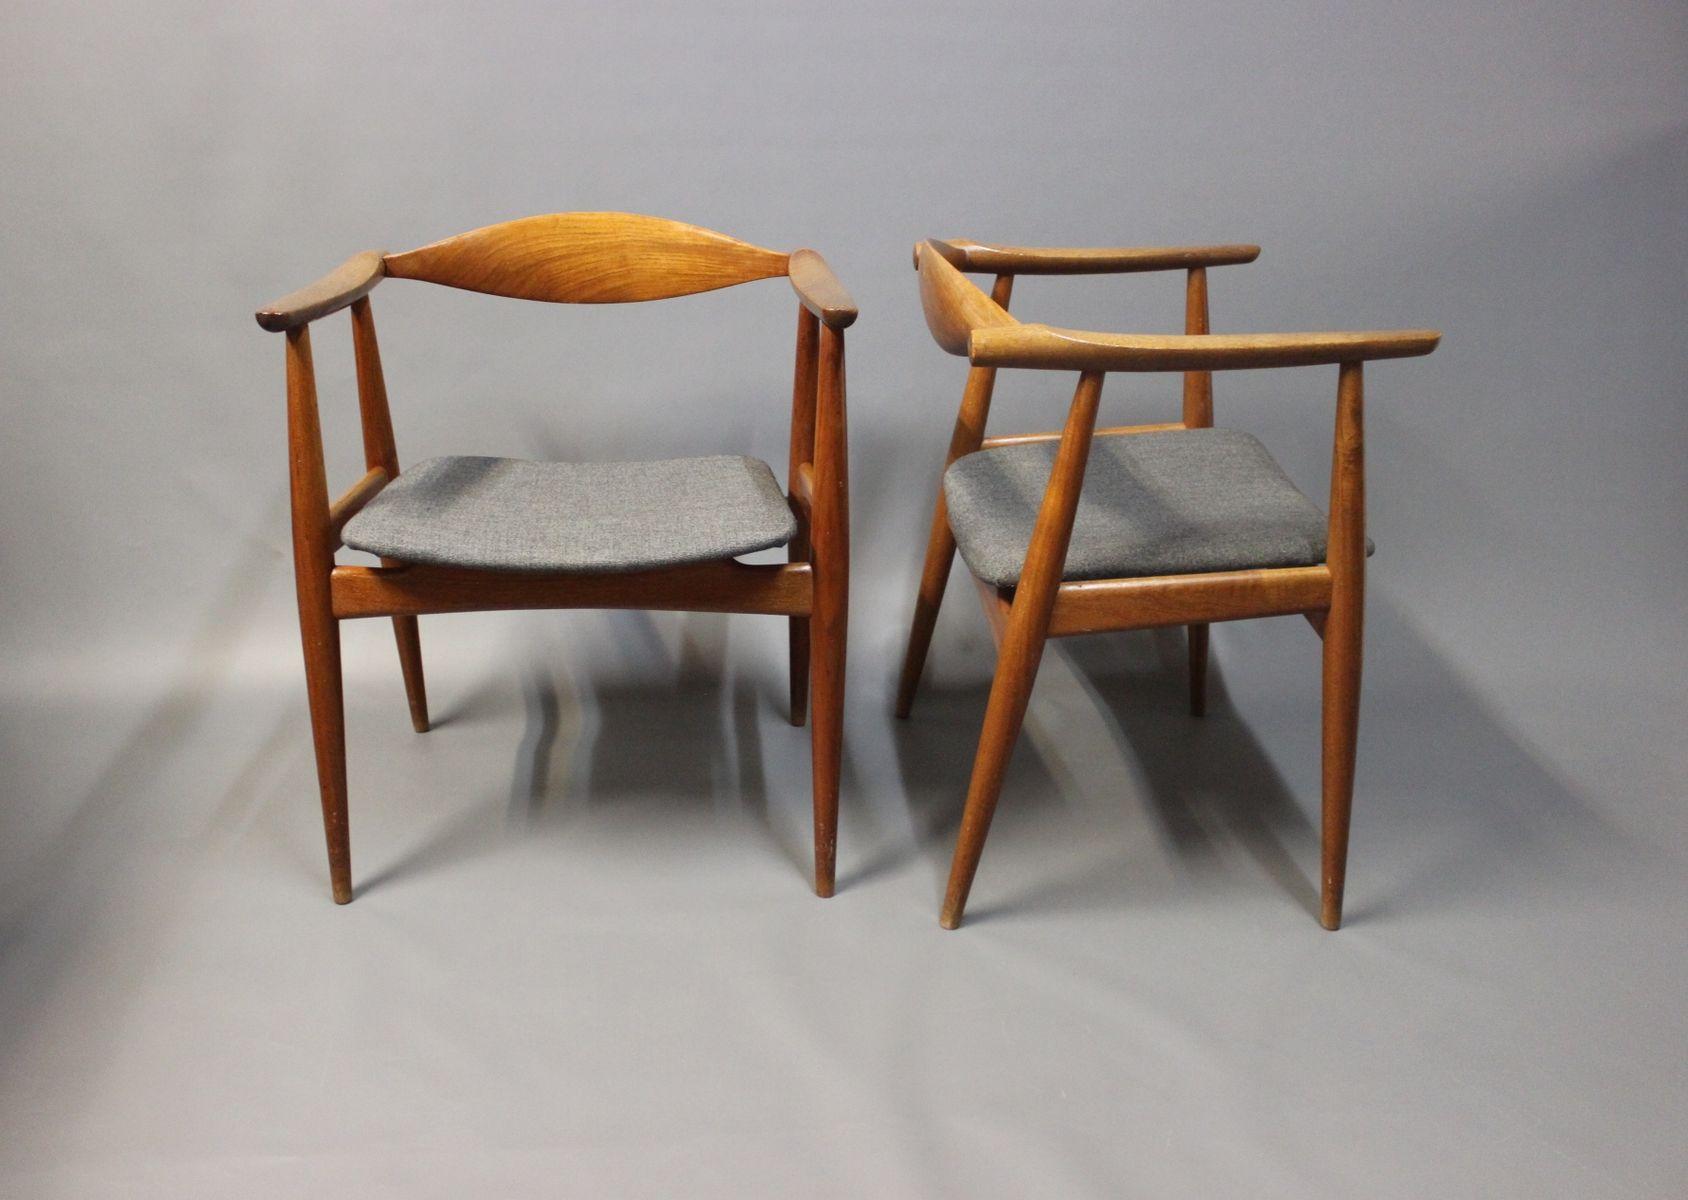 ch 35 chairs by hans j wegner by carl hansen sn 1960s set of